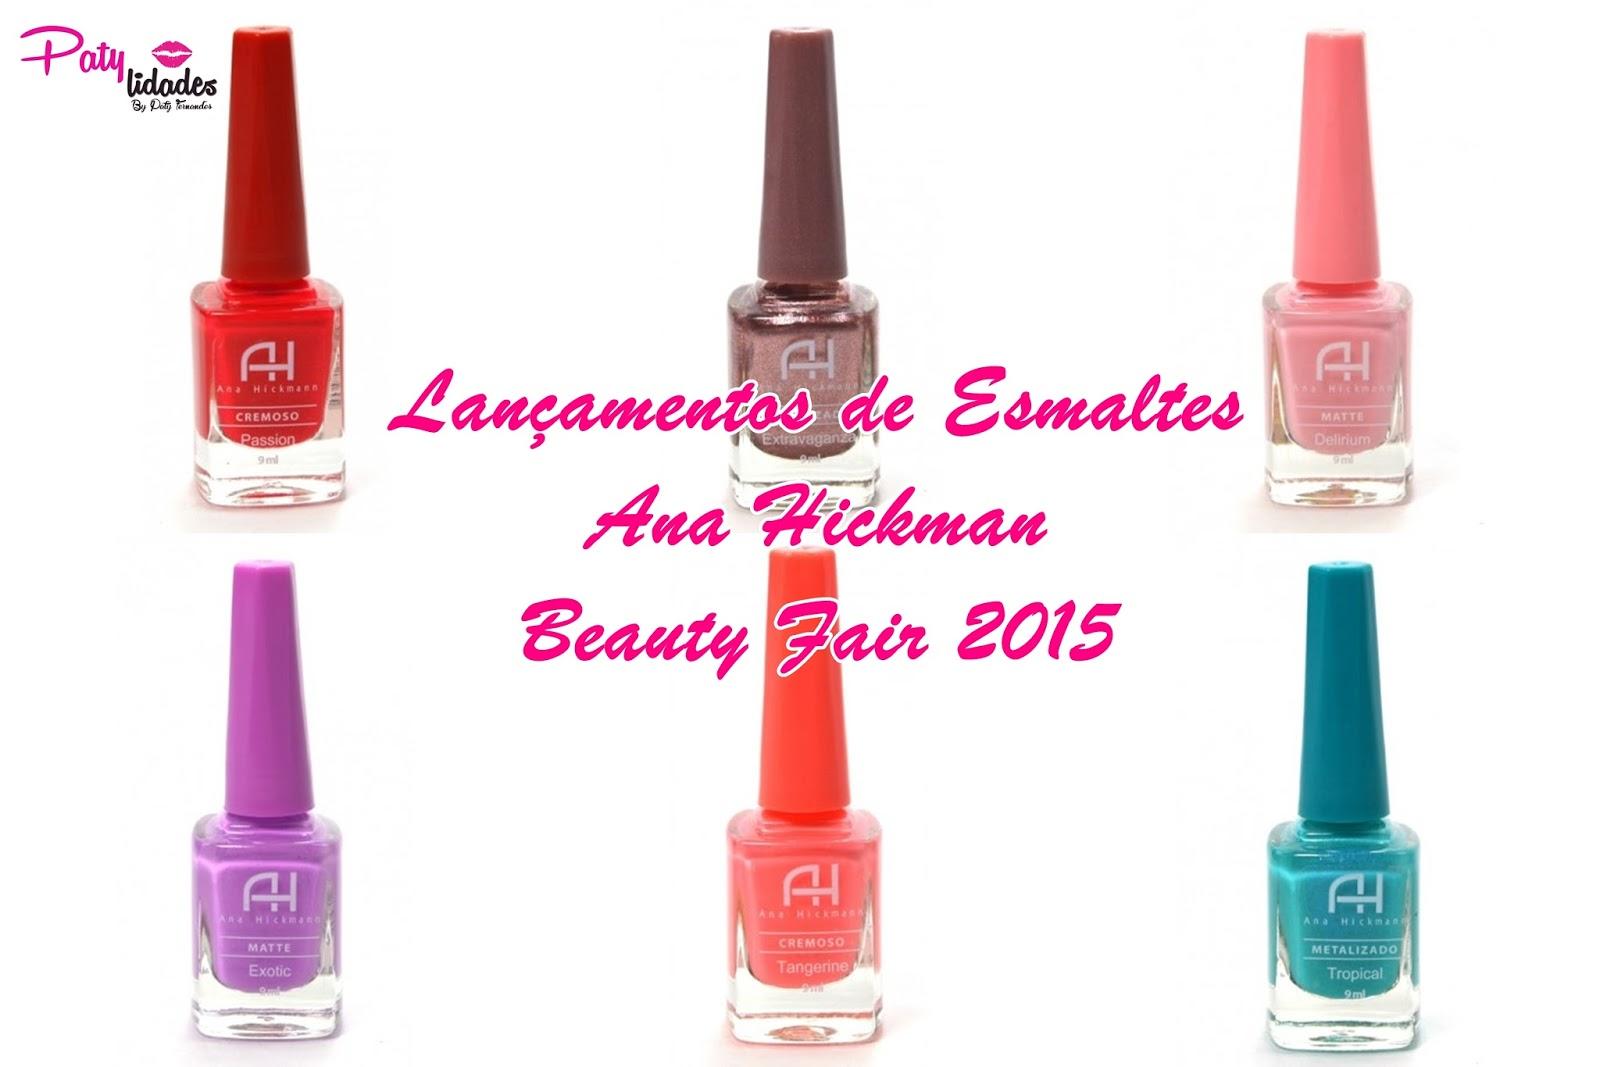 Lançamentos Esmaltes Ana Hickmann Beauty Fair 2015 - Patylidades cbde05be0a